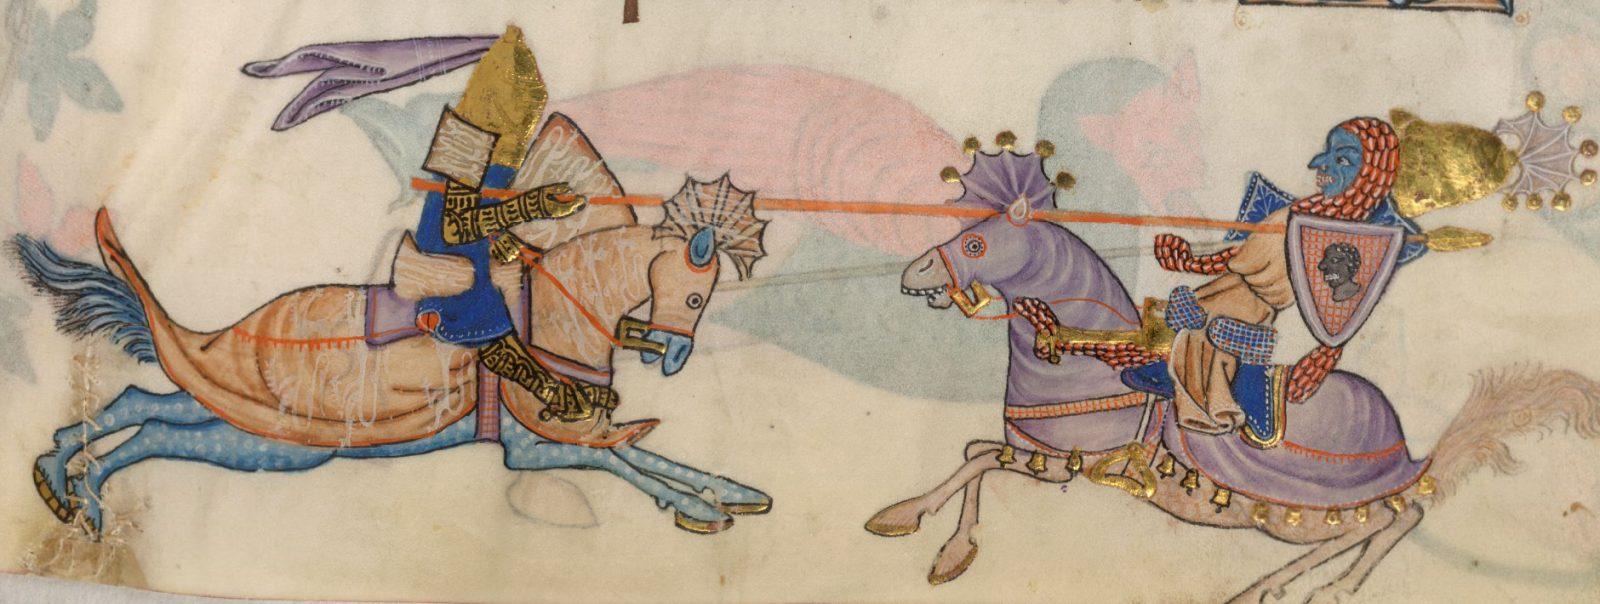 Richard I and Saladin jousting - Bike Odyssey Cycle Tours